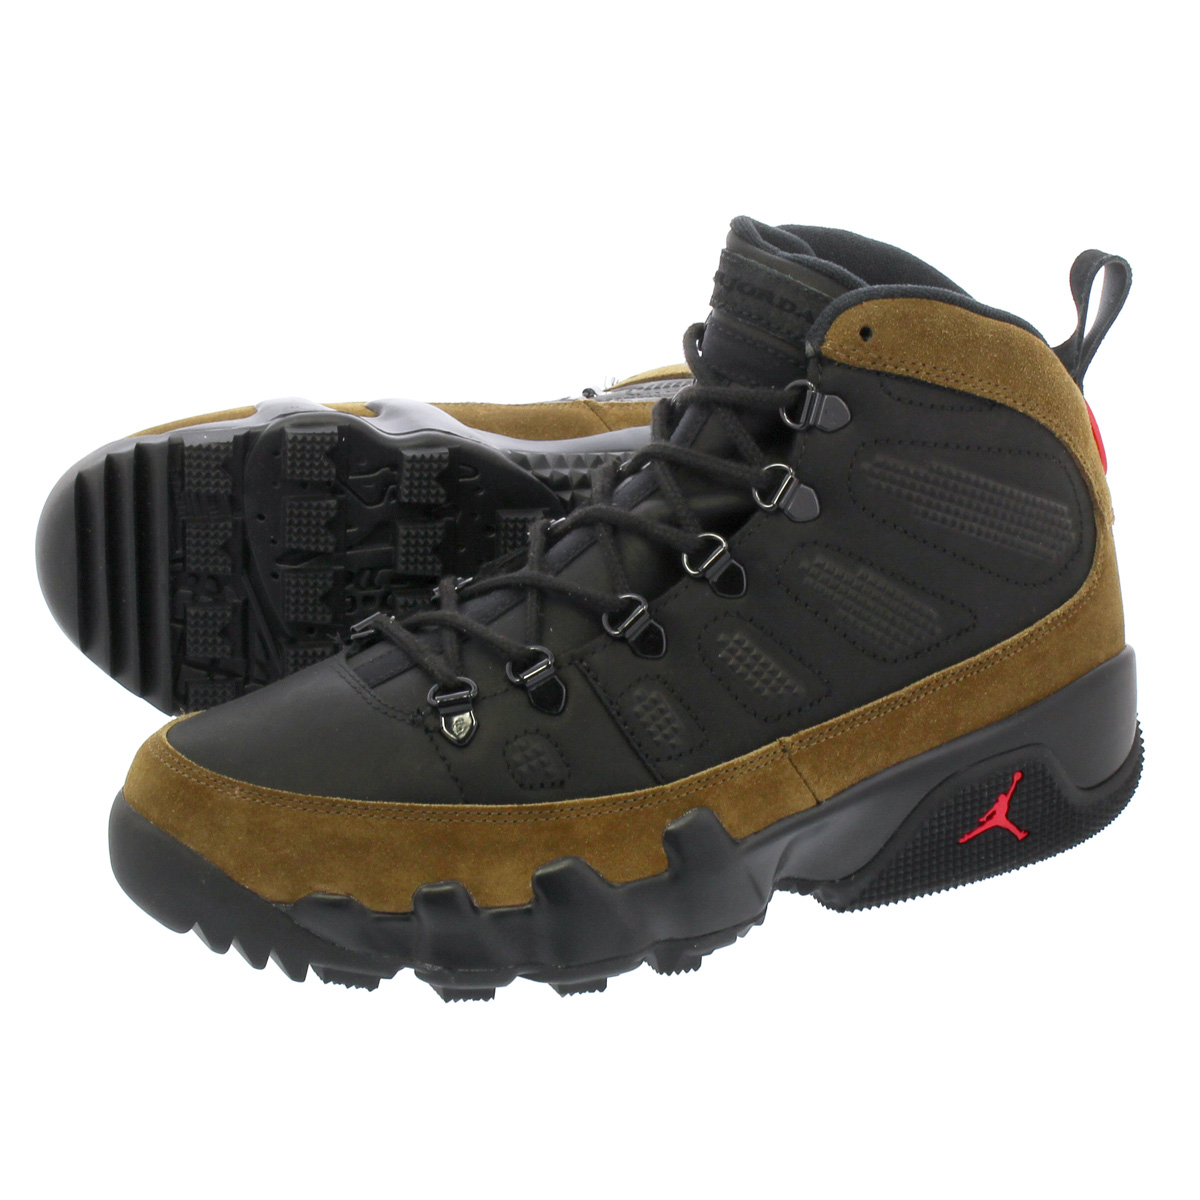 buy online d5efd 1416c NIKE AIR JORDAN 9 RETRO NRG Nike air Jordan 9 nostalgic NRG BLACK/TRUE  RED/LIGHT OLIVE